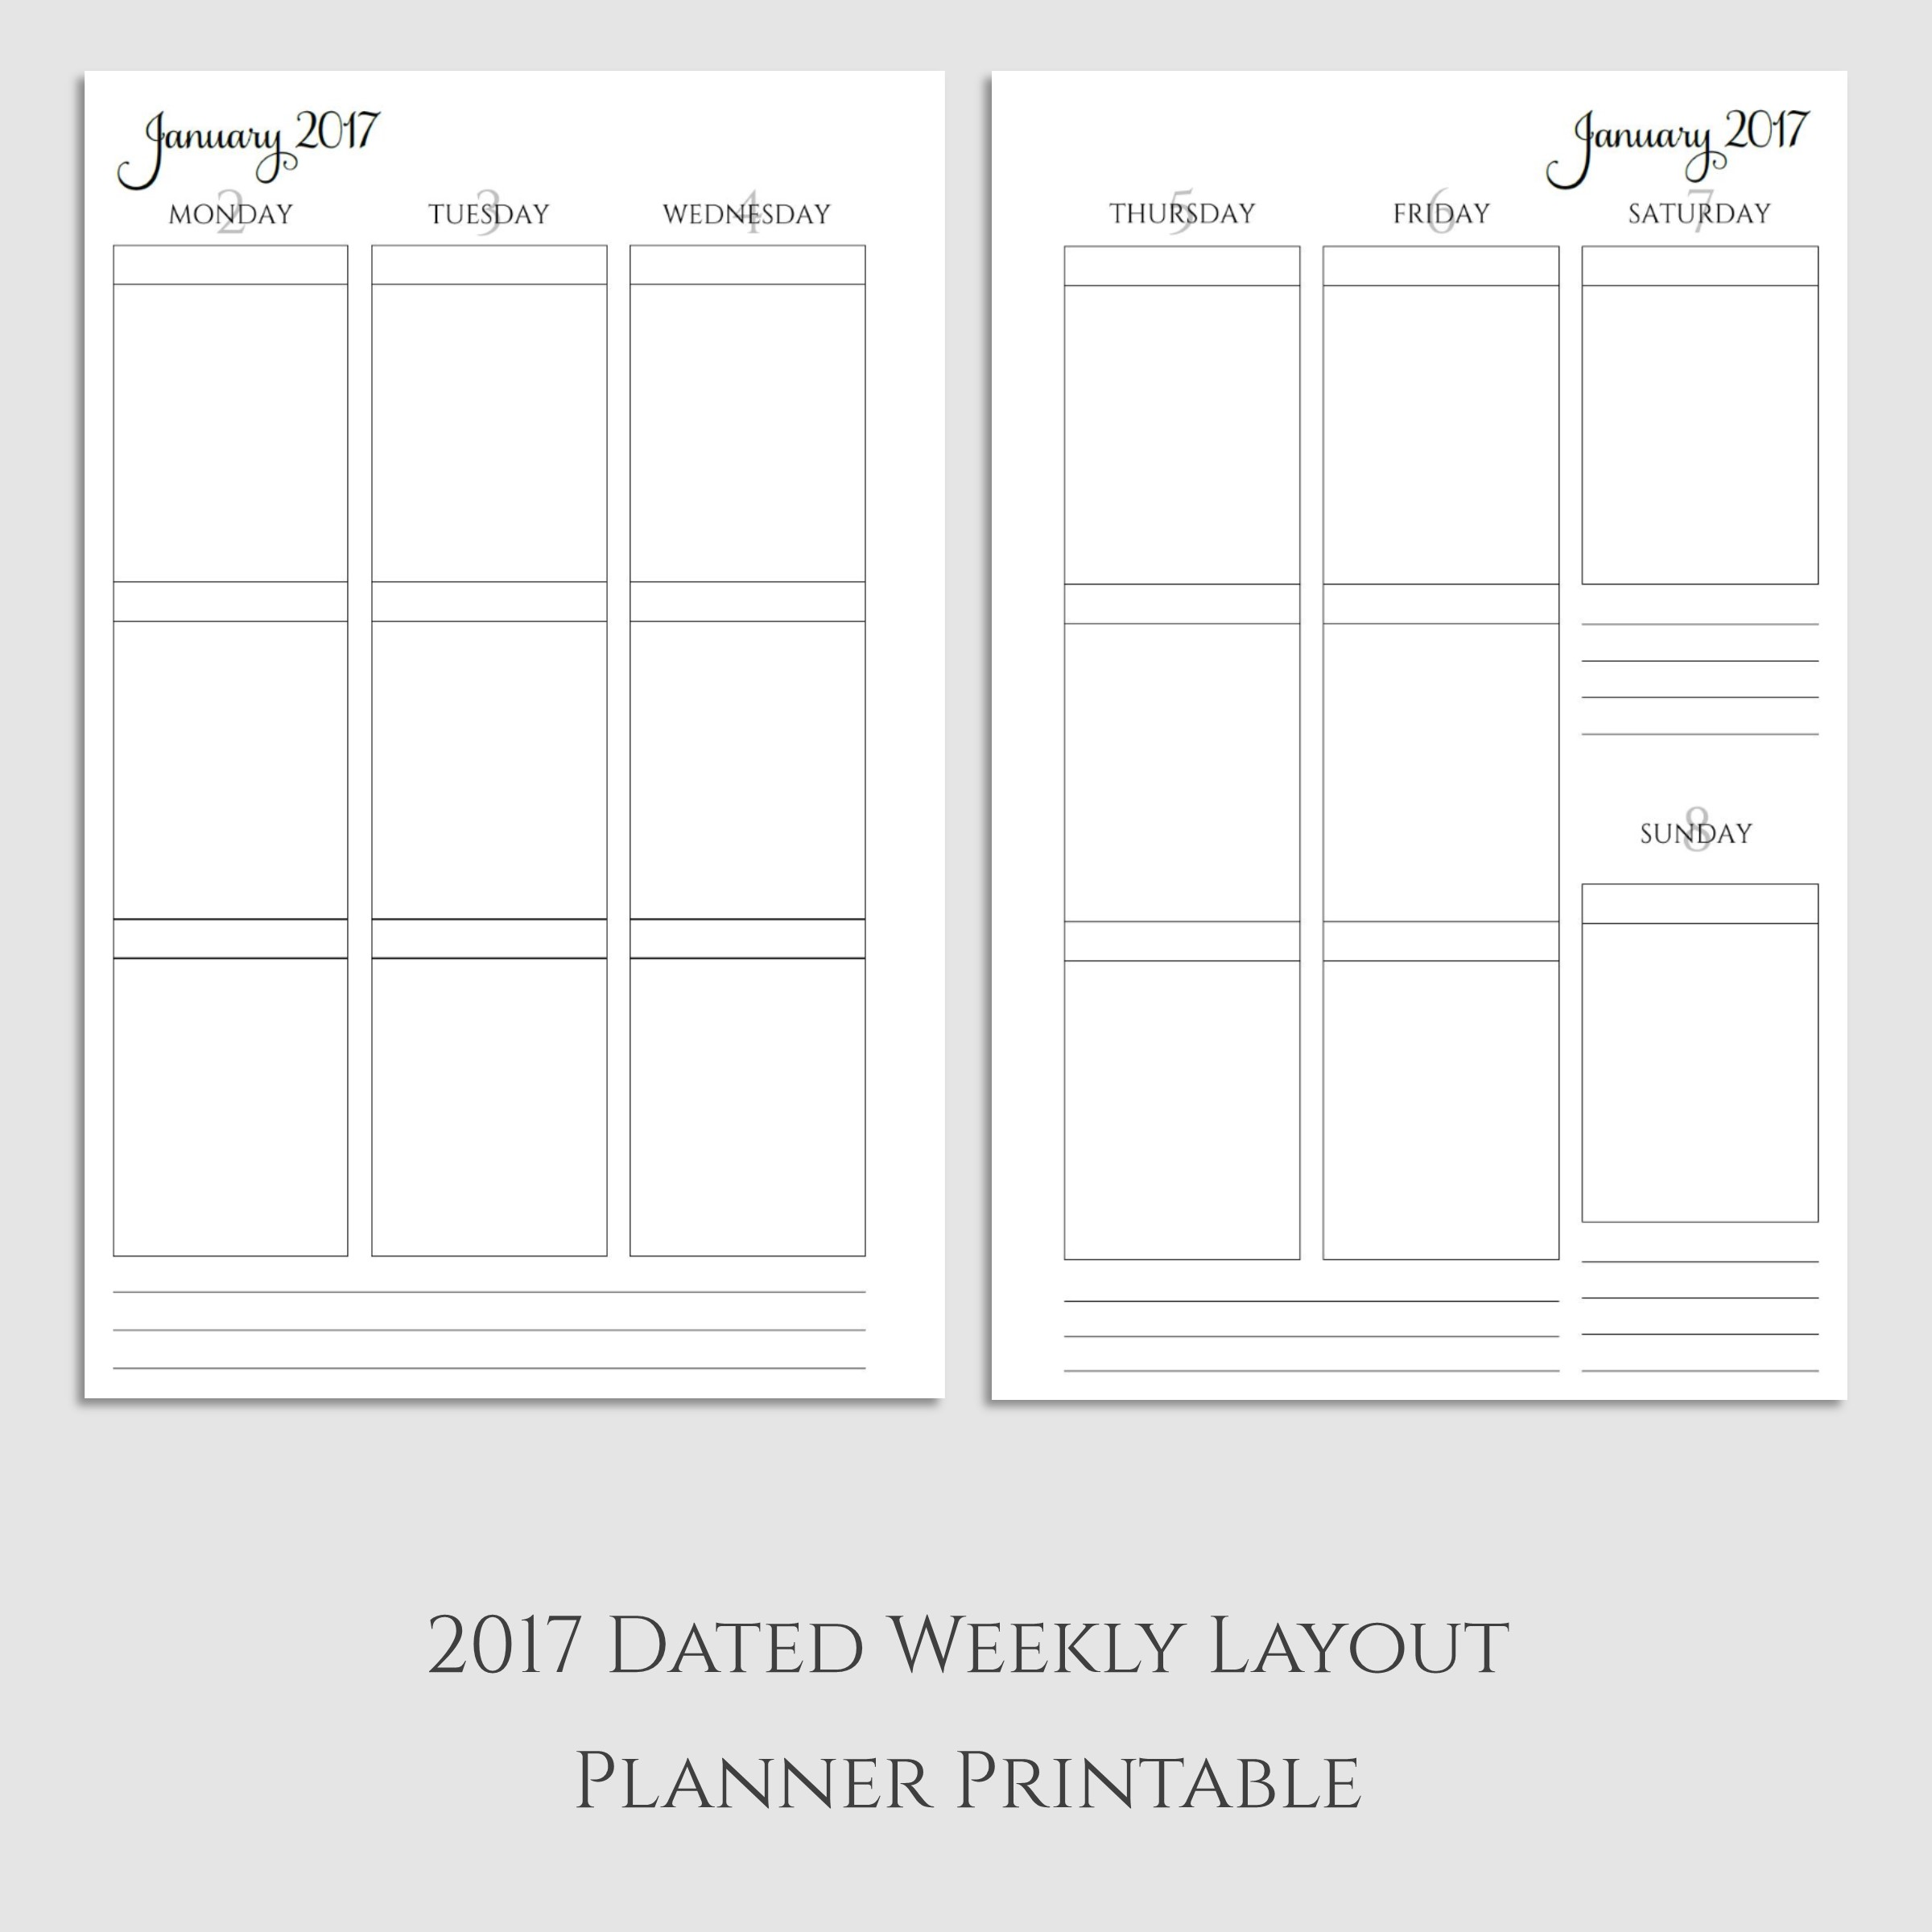 2017 Weekly Vertical Boxes Planner Printable